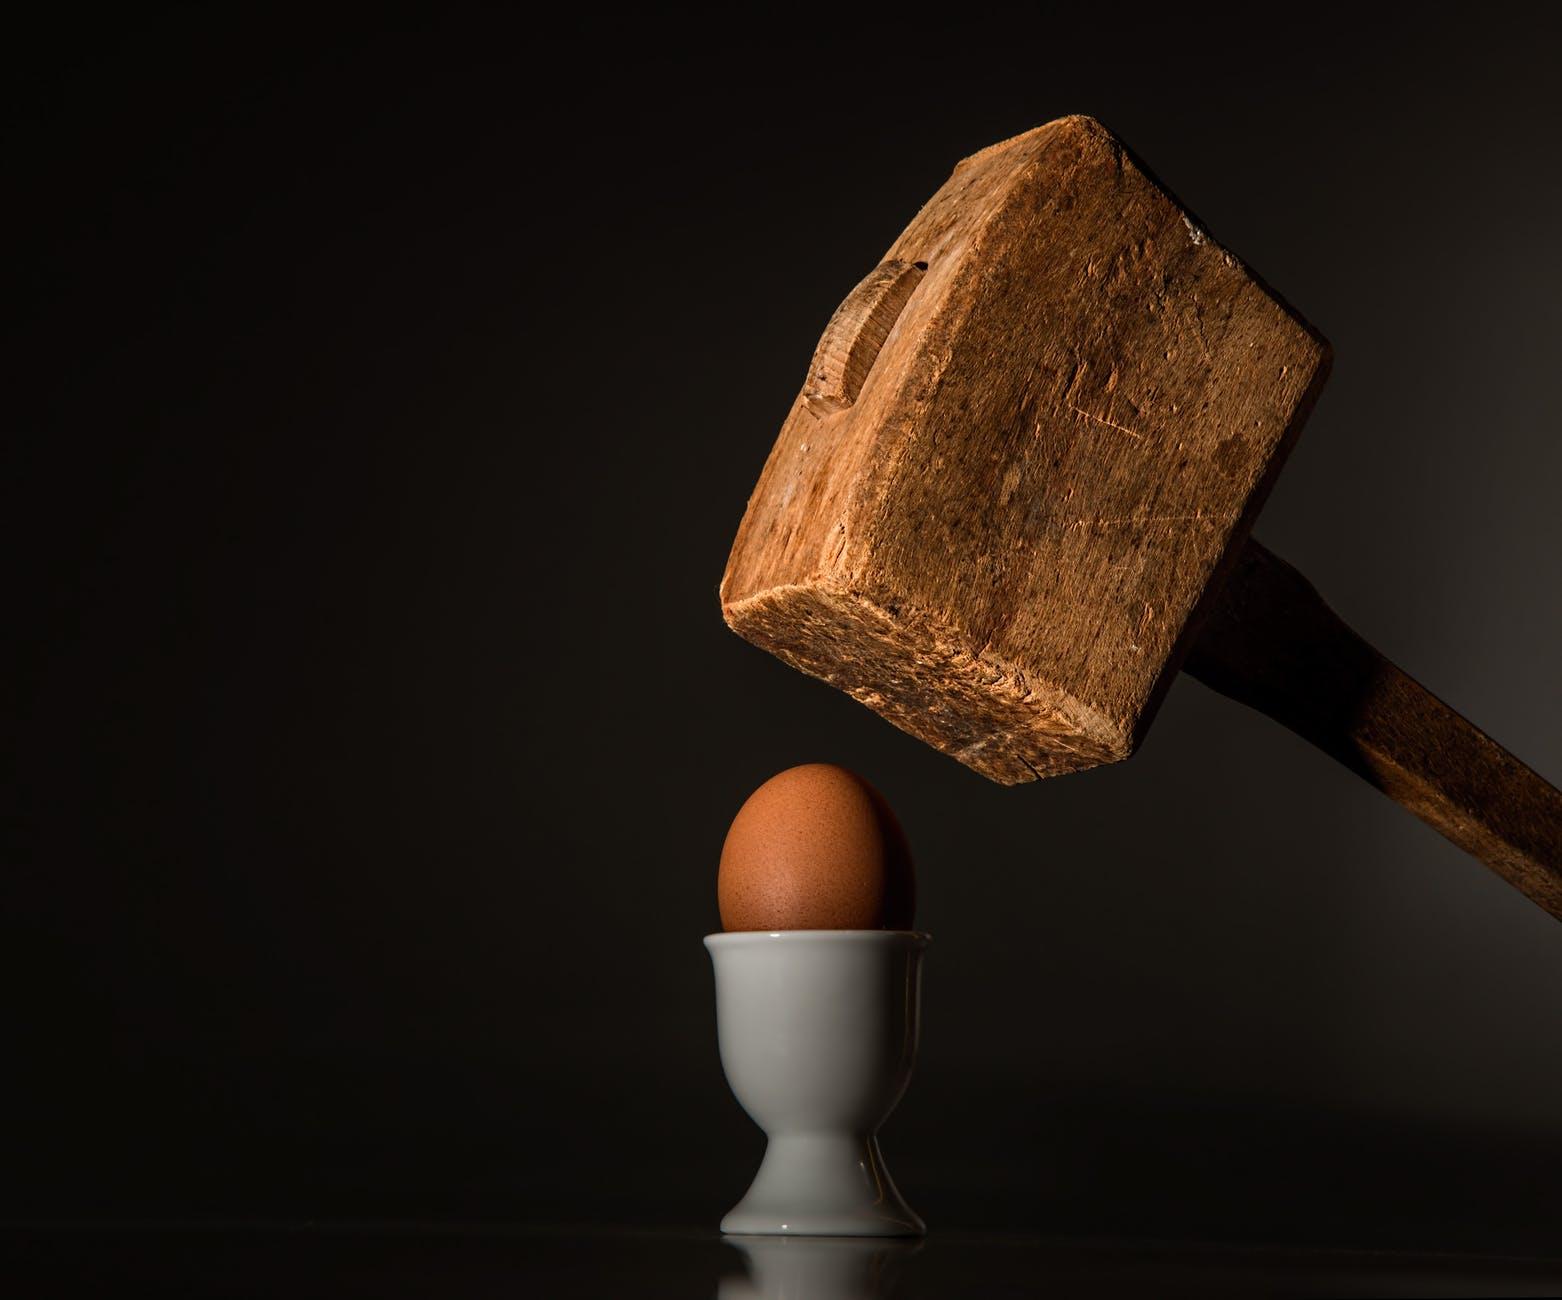 egg power fear hammer